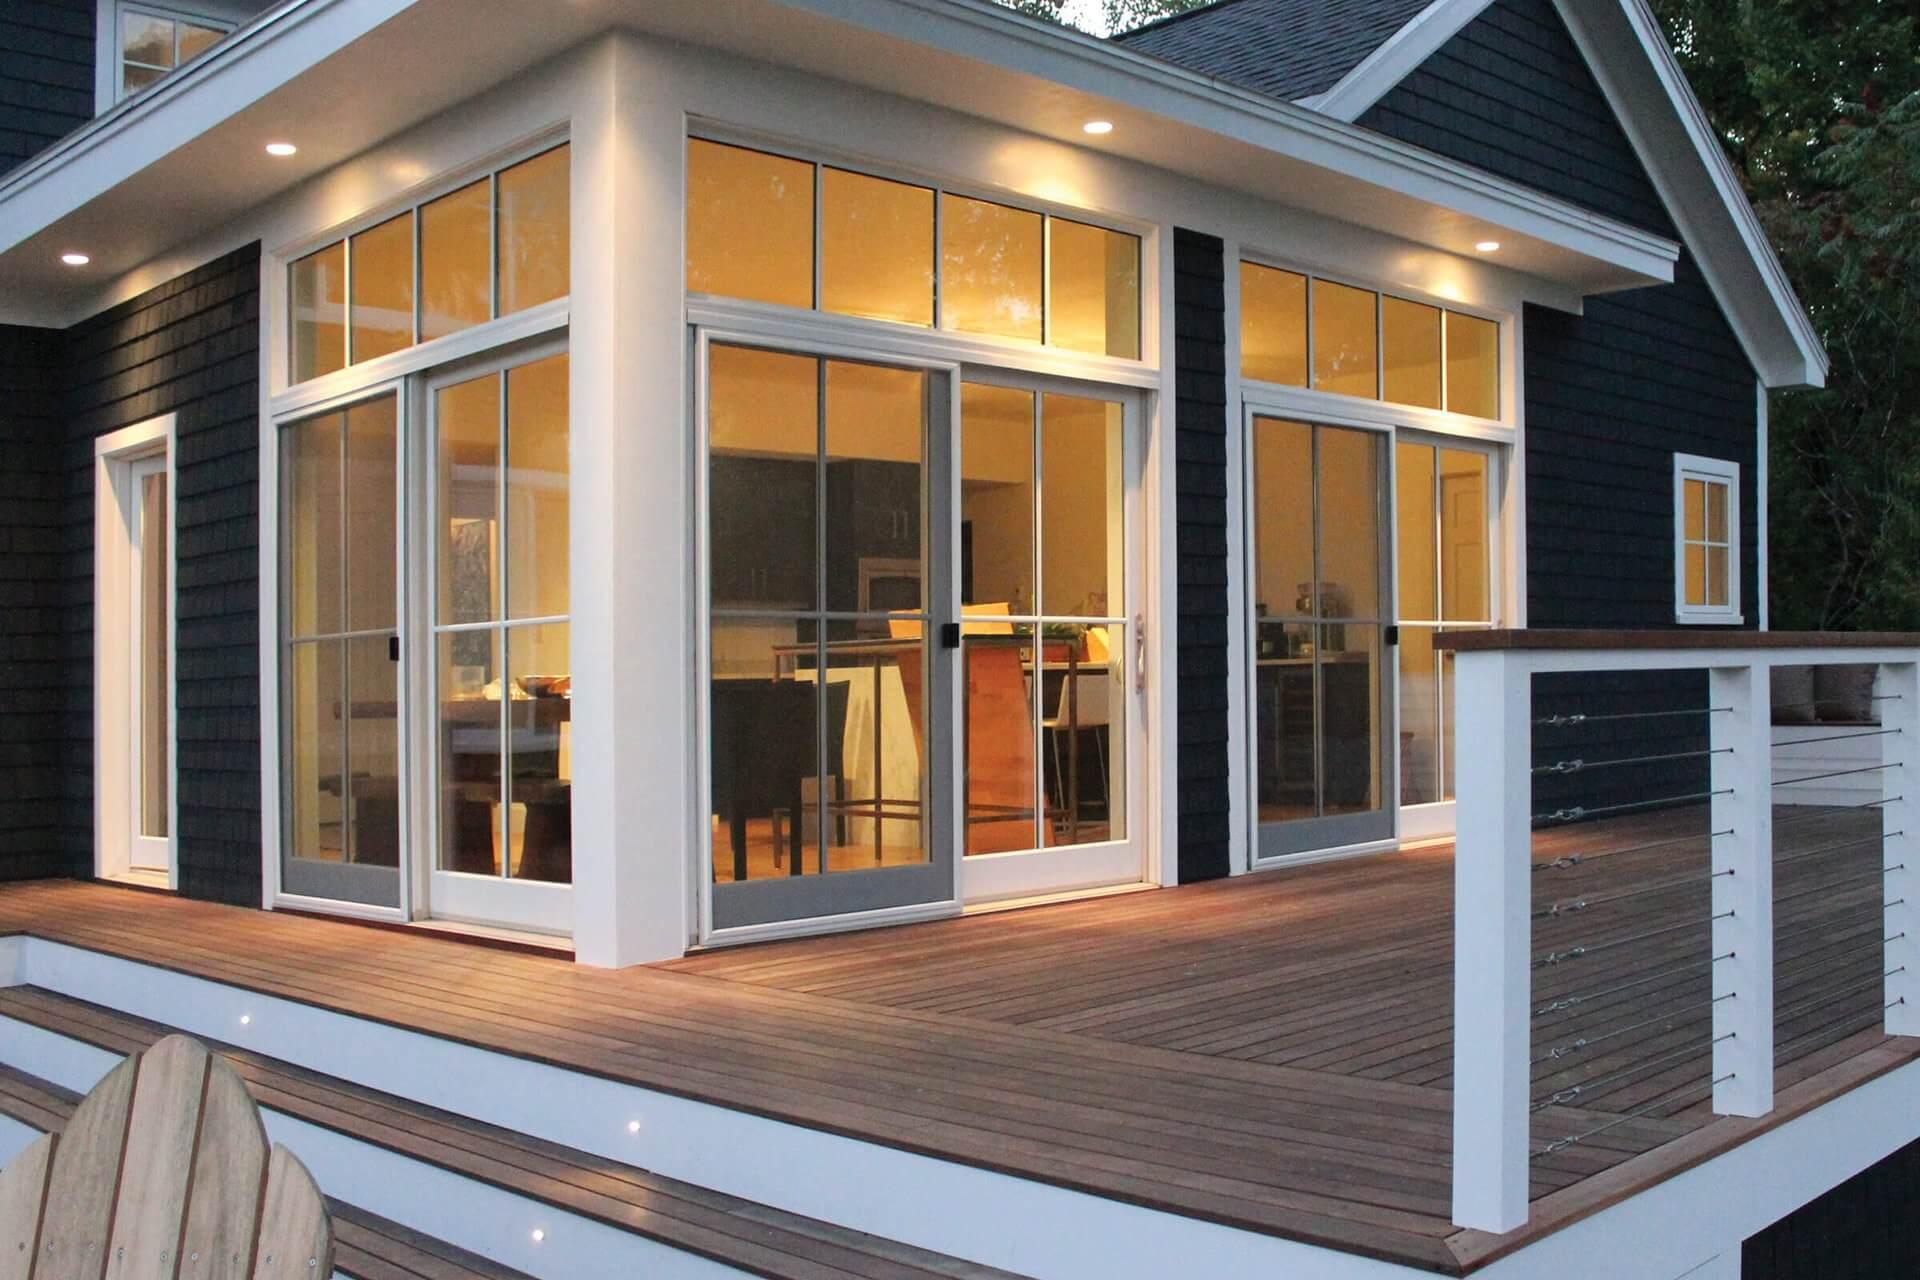 elevate-sliding-french-door-4-lake-house-overlook